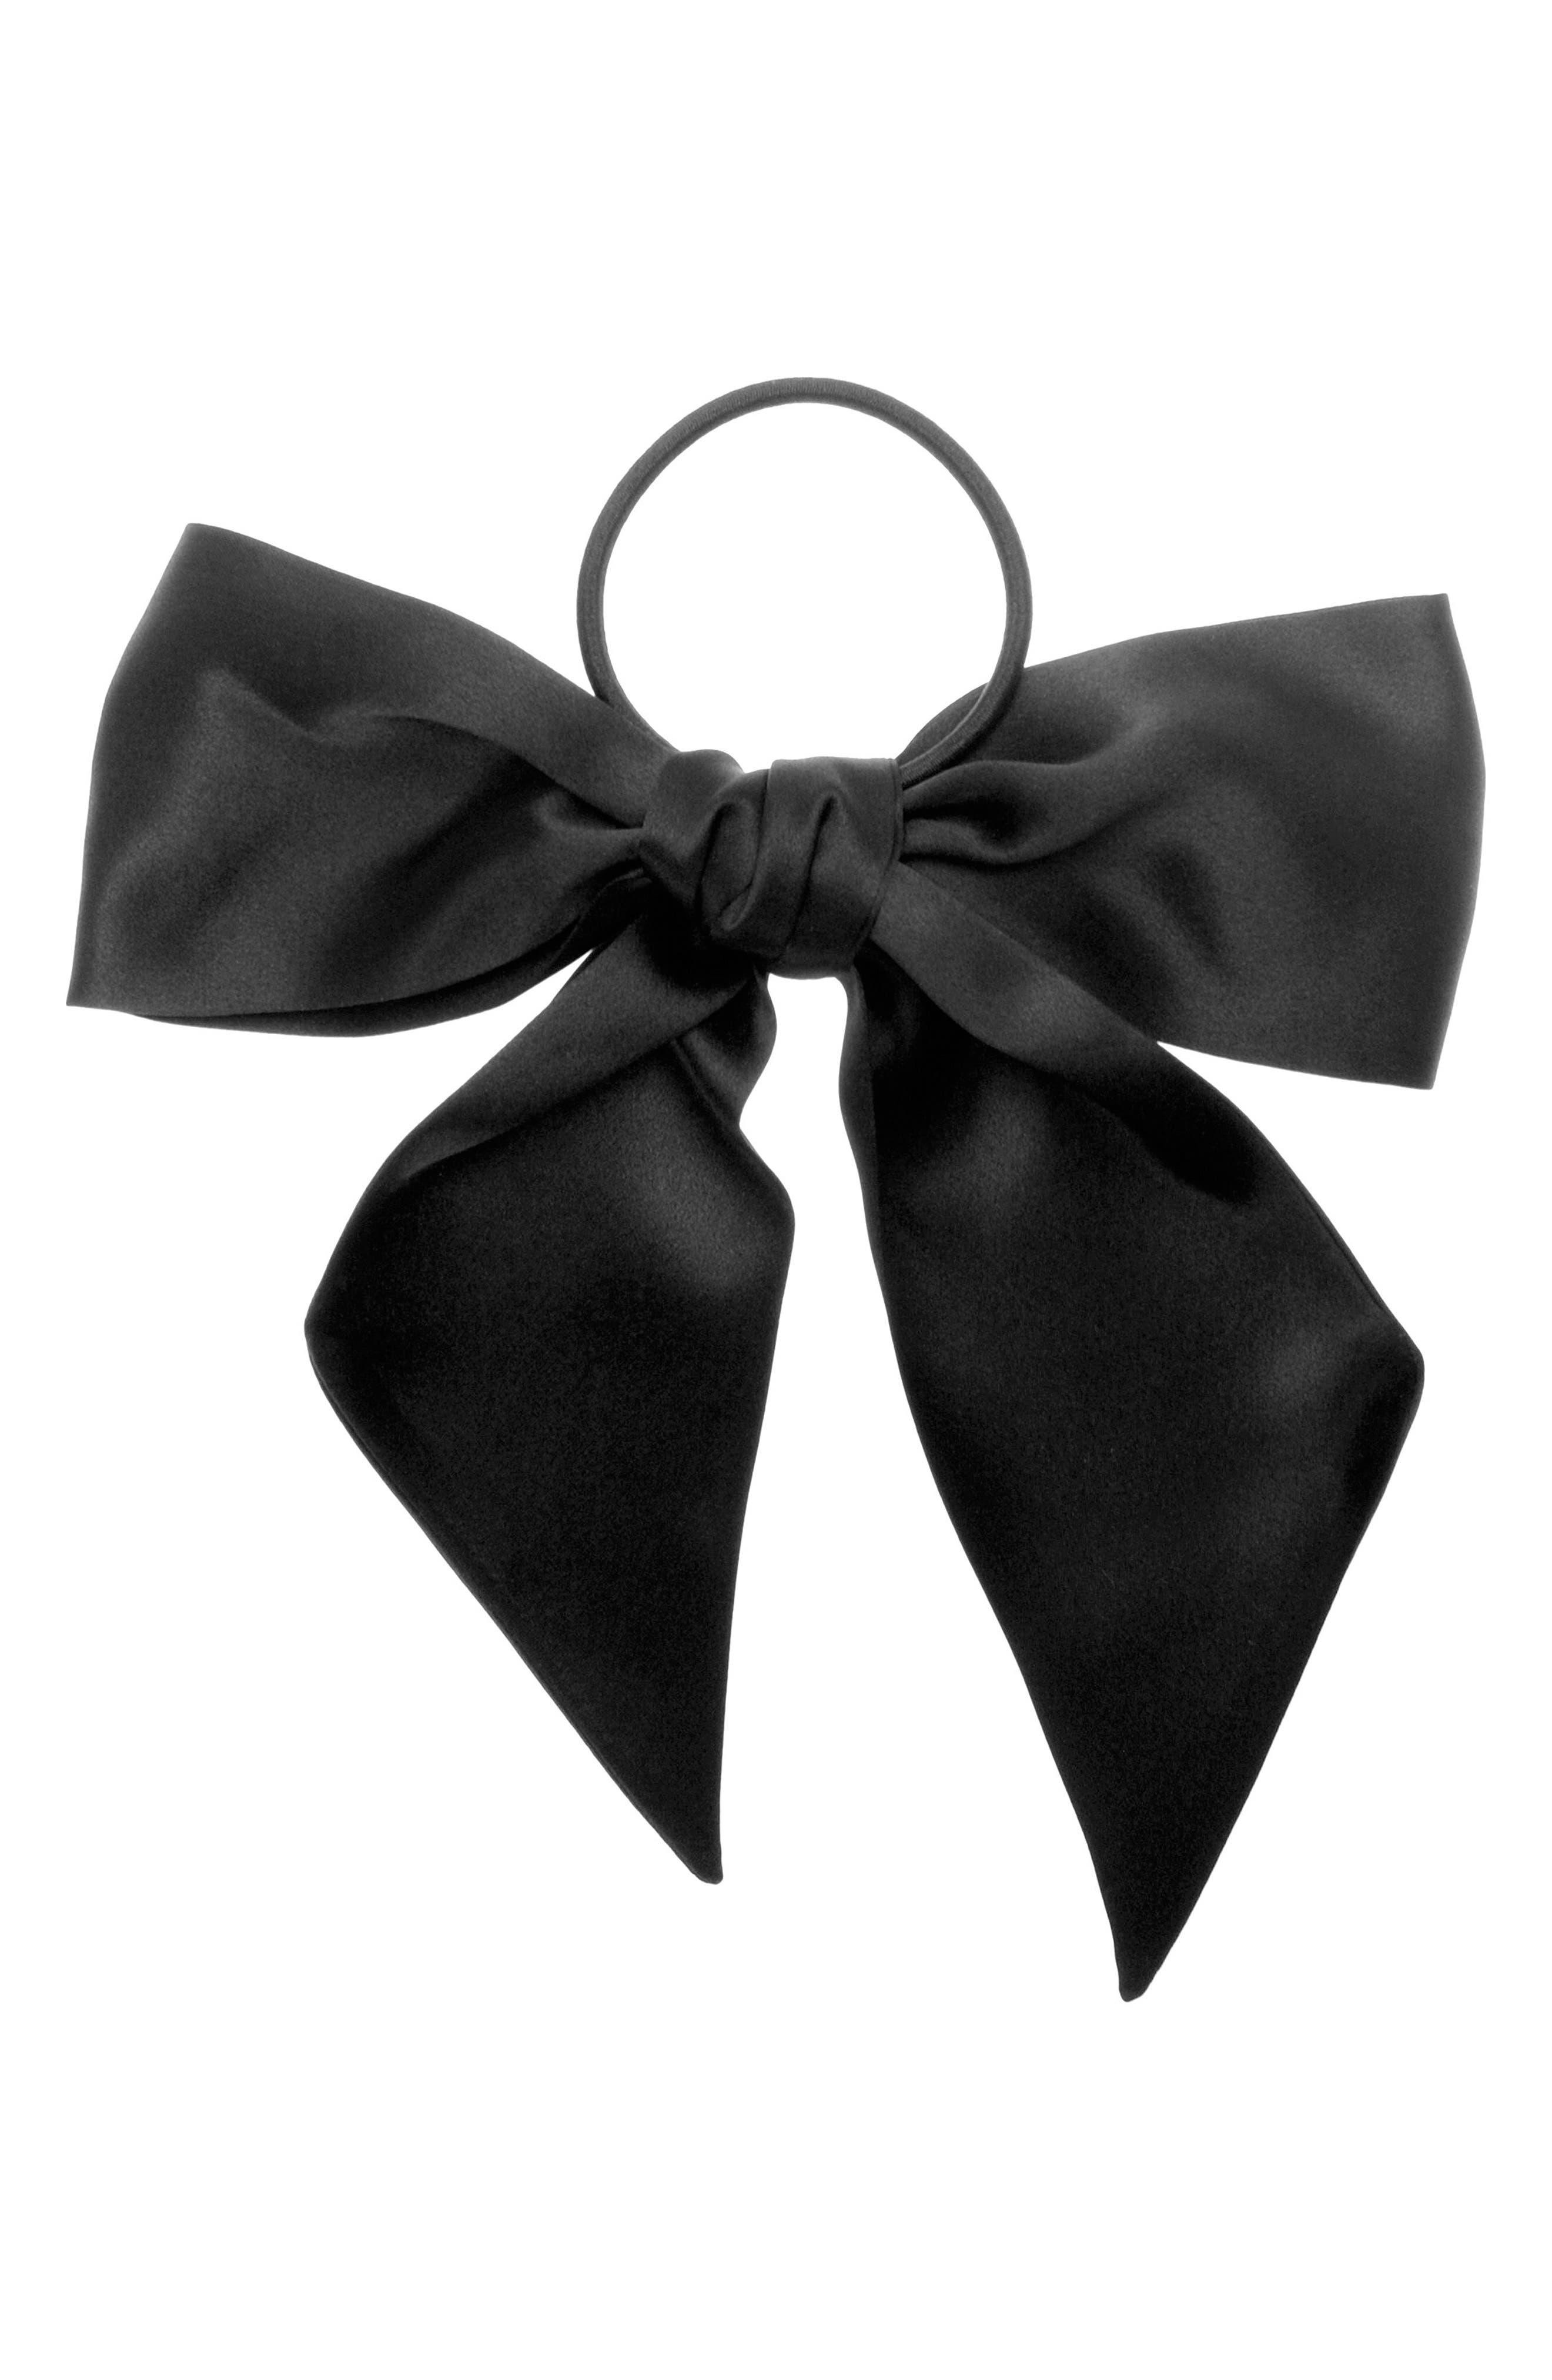 Large Bow Ponytail Holder,                             Main thumbnail 1, color,                             BLACK